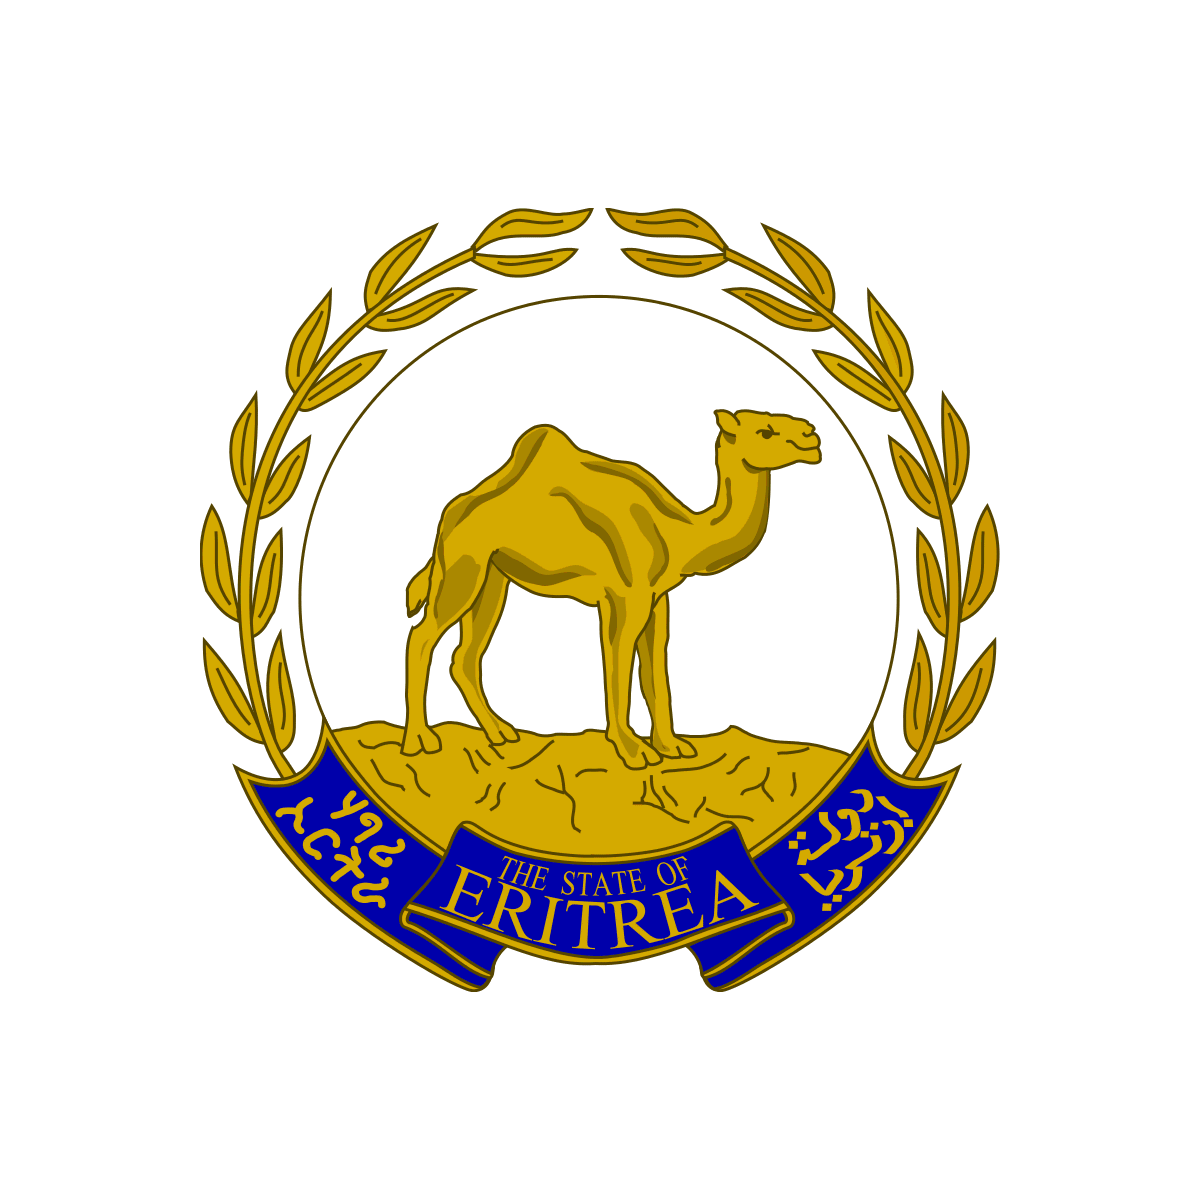 Erytrea wiza do Erytrei. Ambasada.